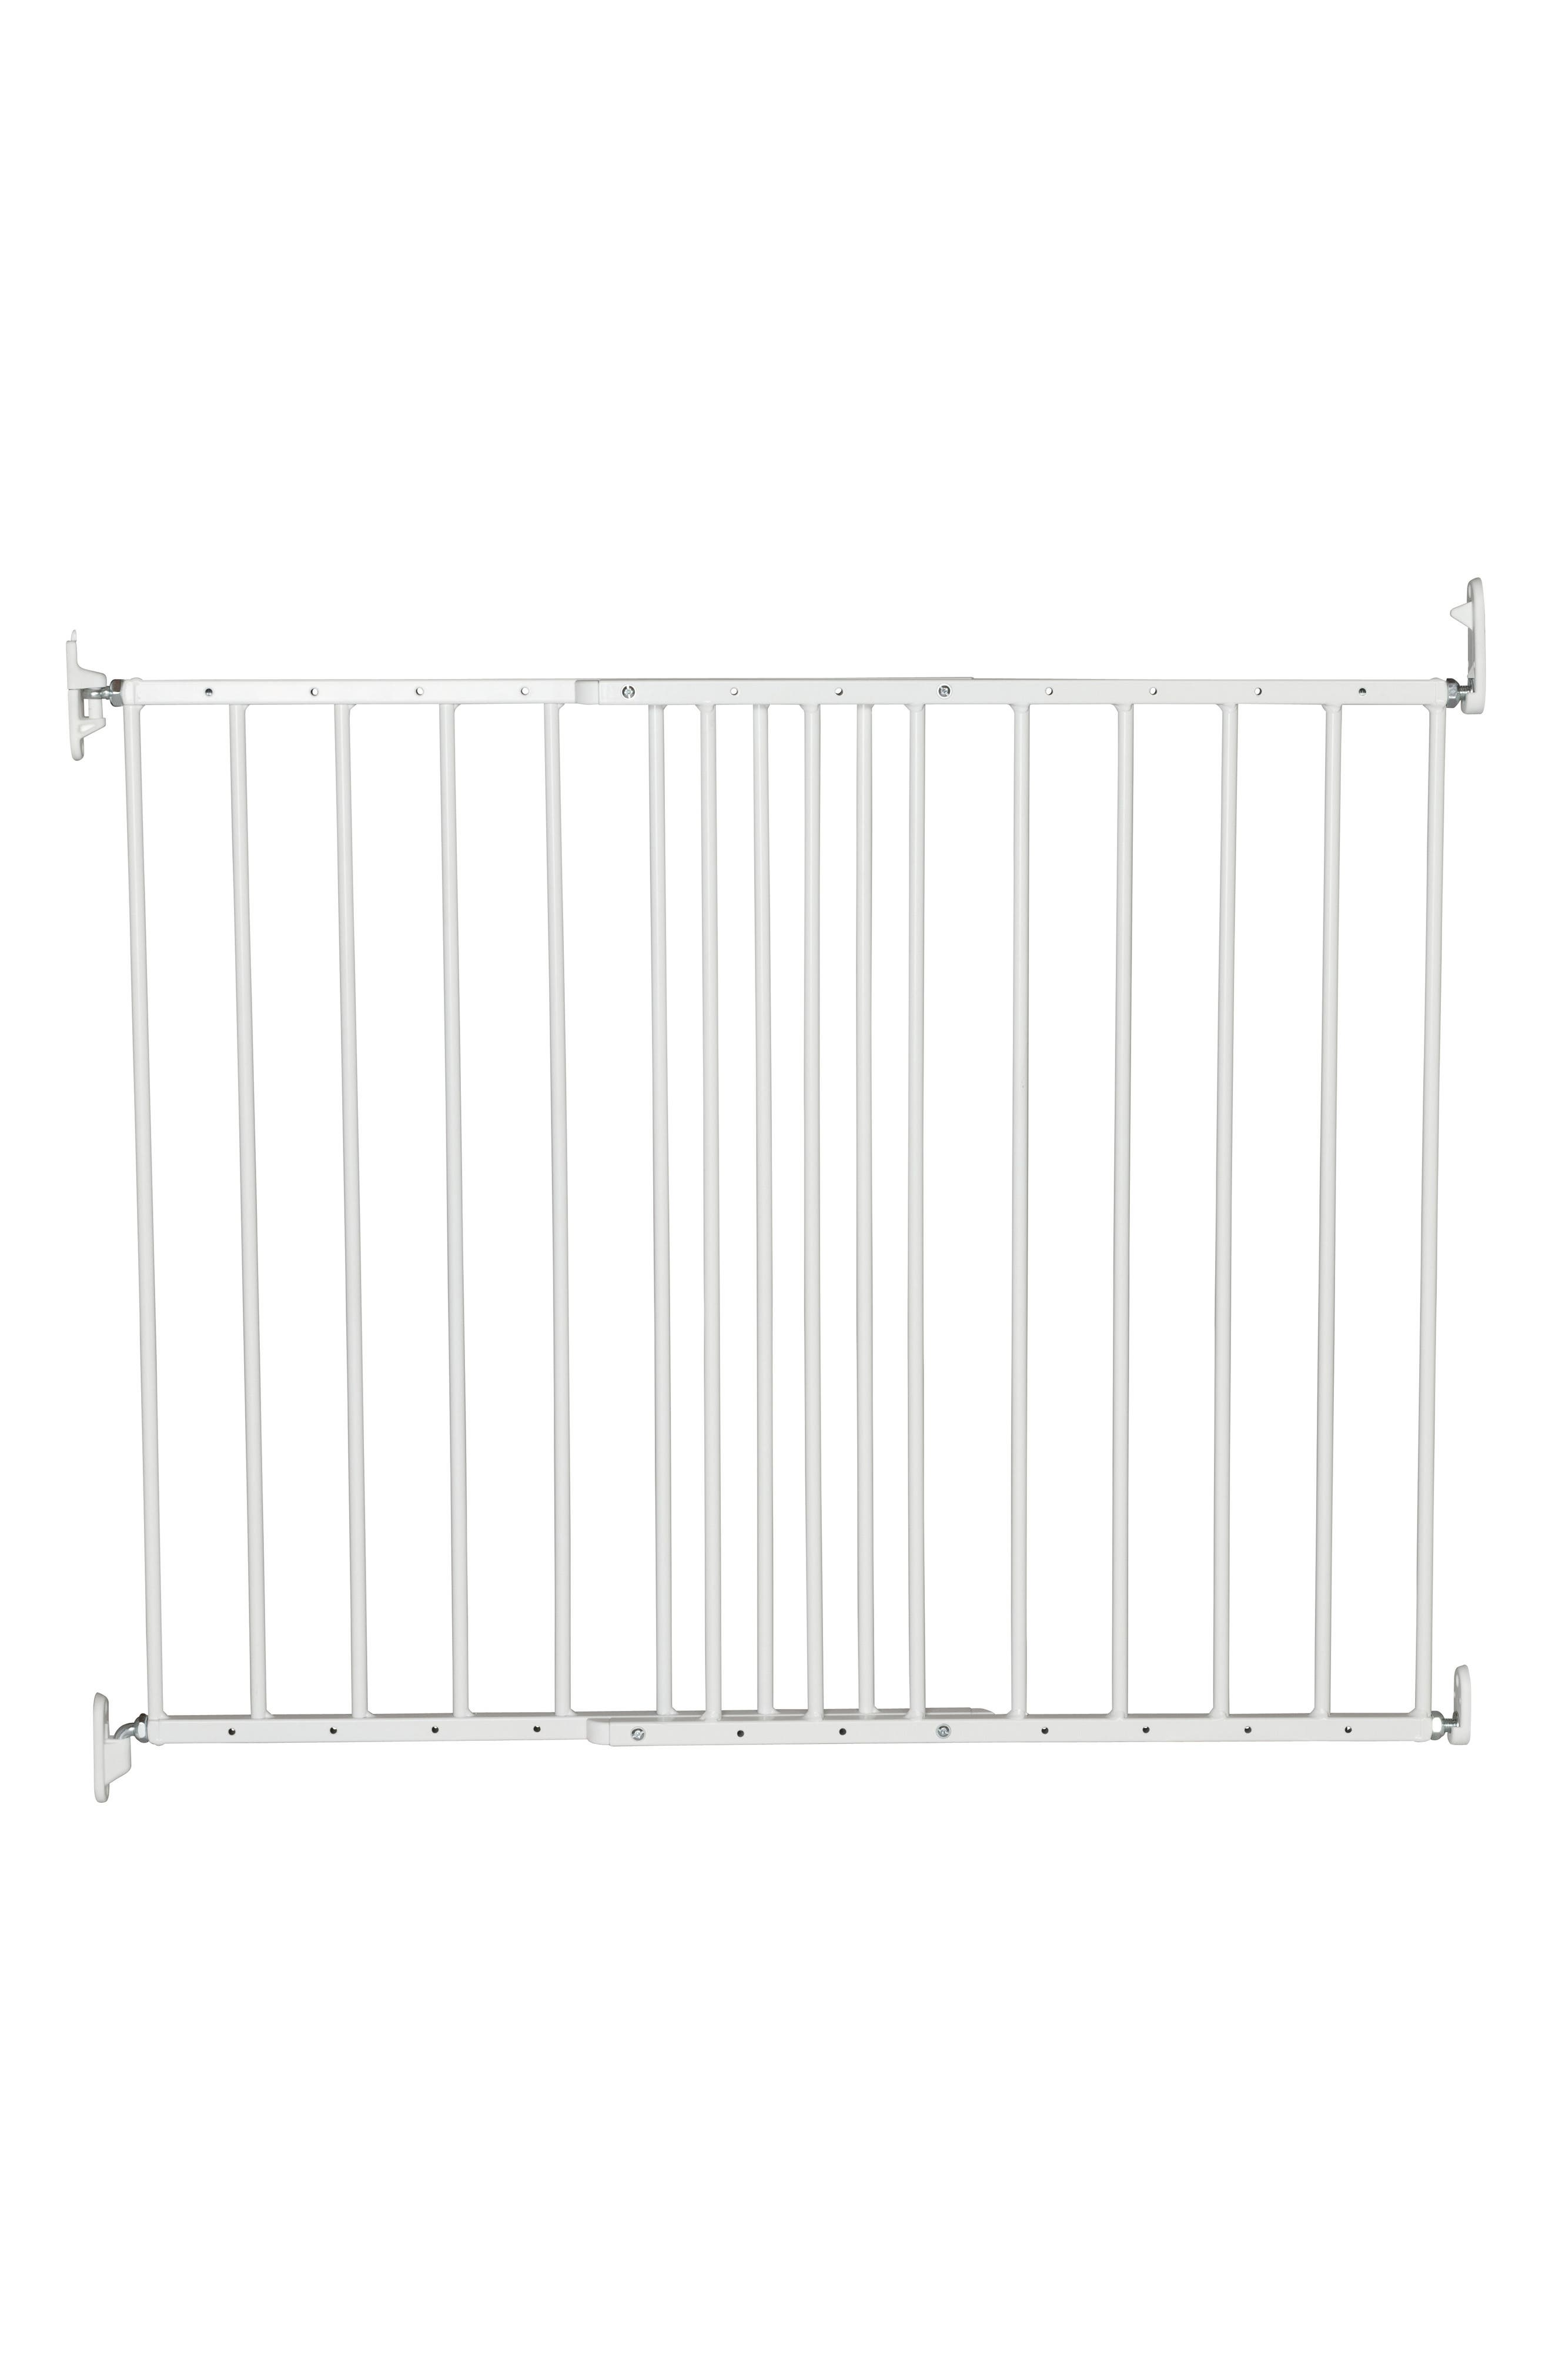 MultiDan Extending Hard Mount Metal Safety Gate,                         Main,                         color, White